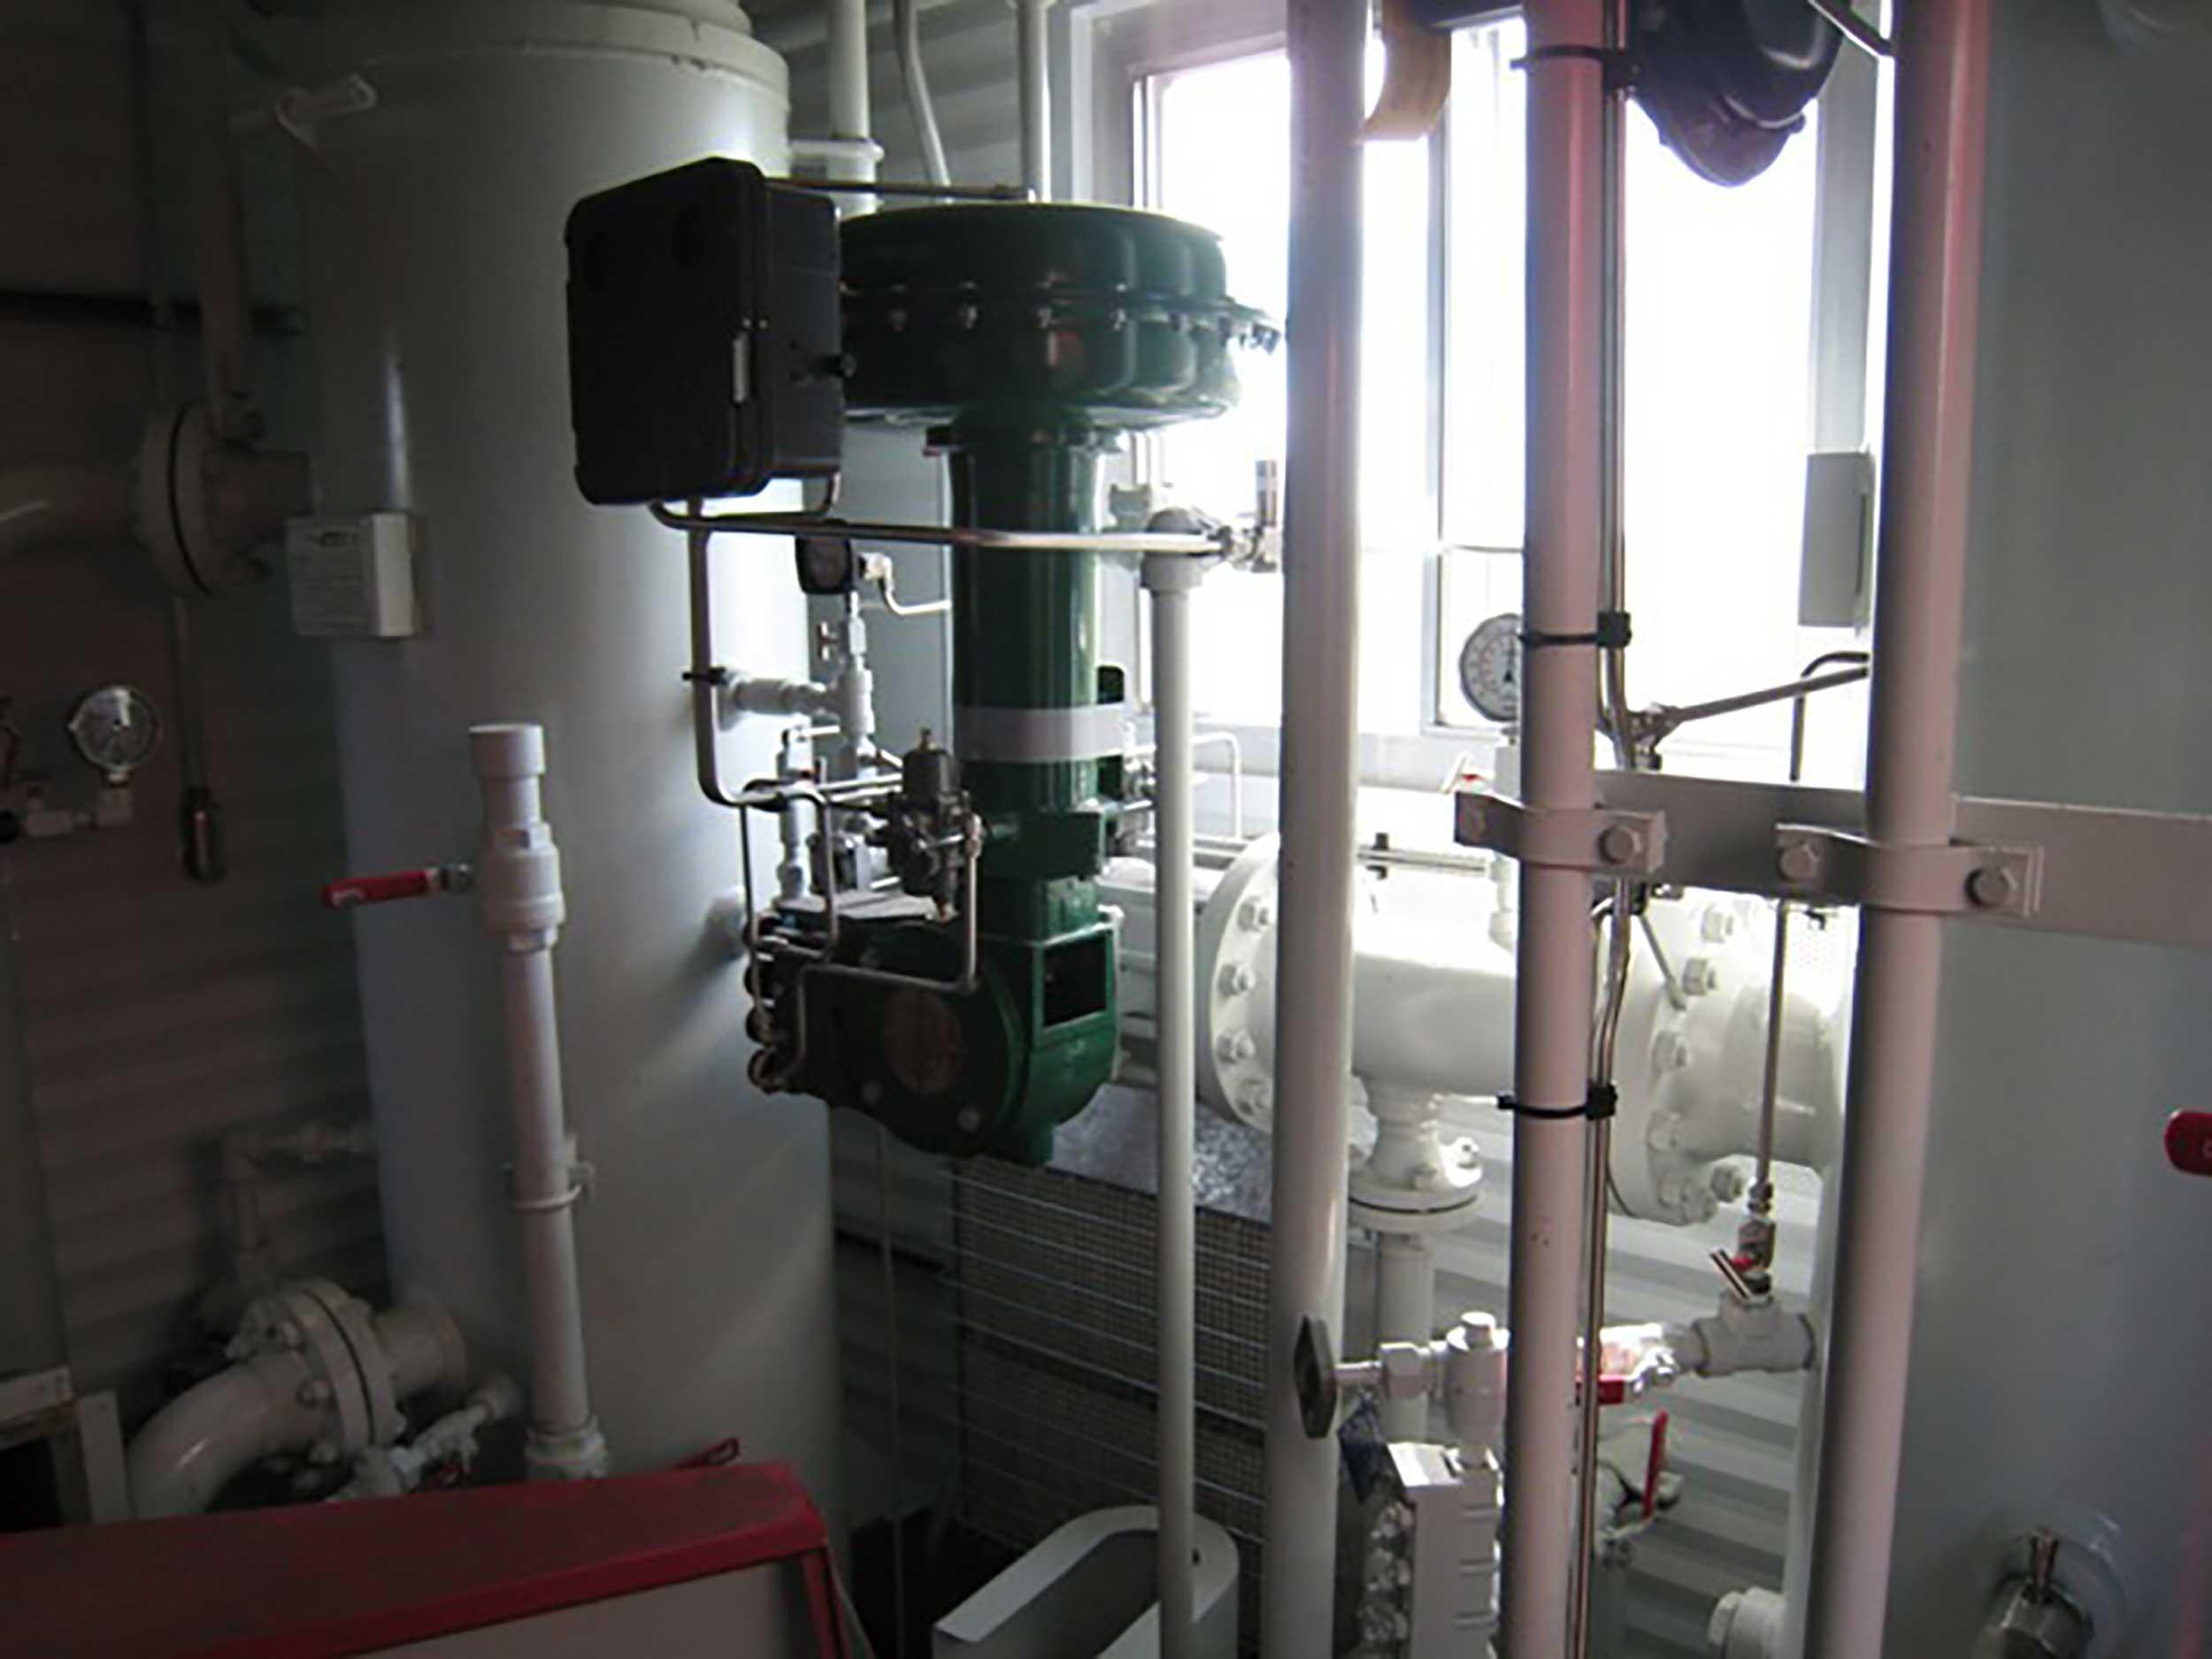 Interior 5 New / Never Used 95HP Caterpillar Vacuum Reciprocating Compressors For Sale in Alberta Canada